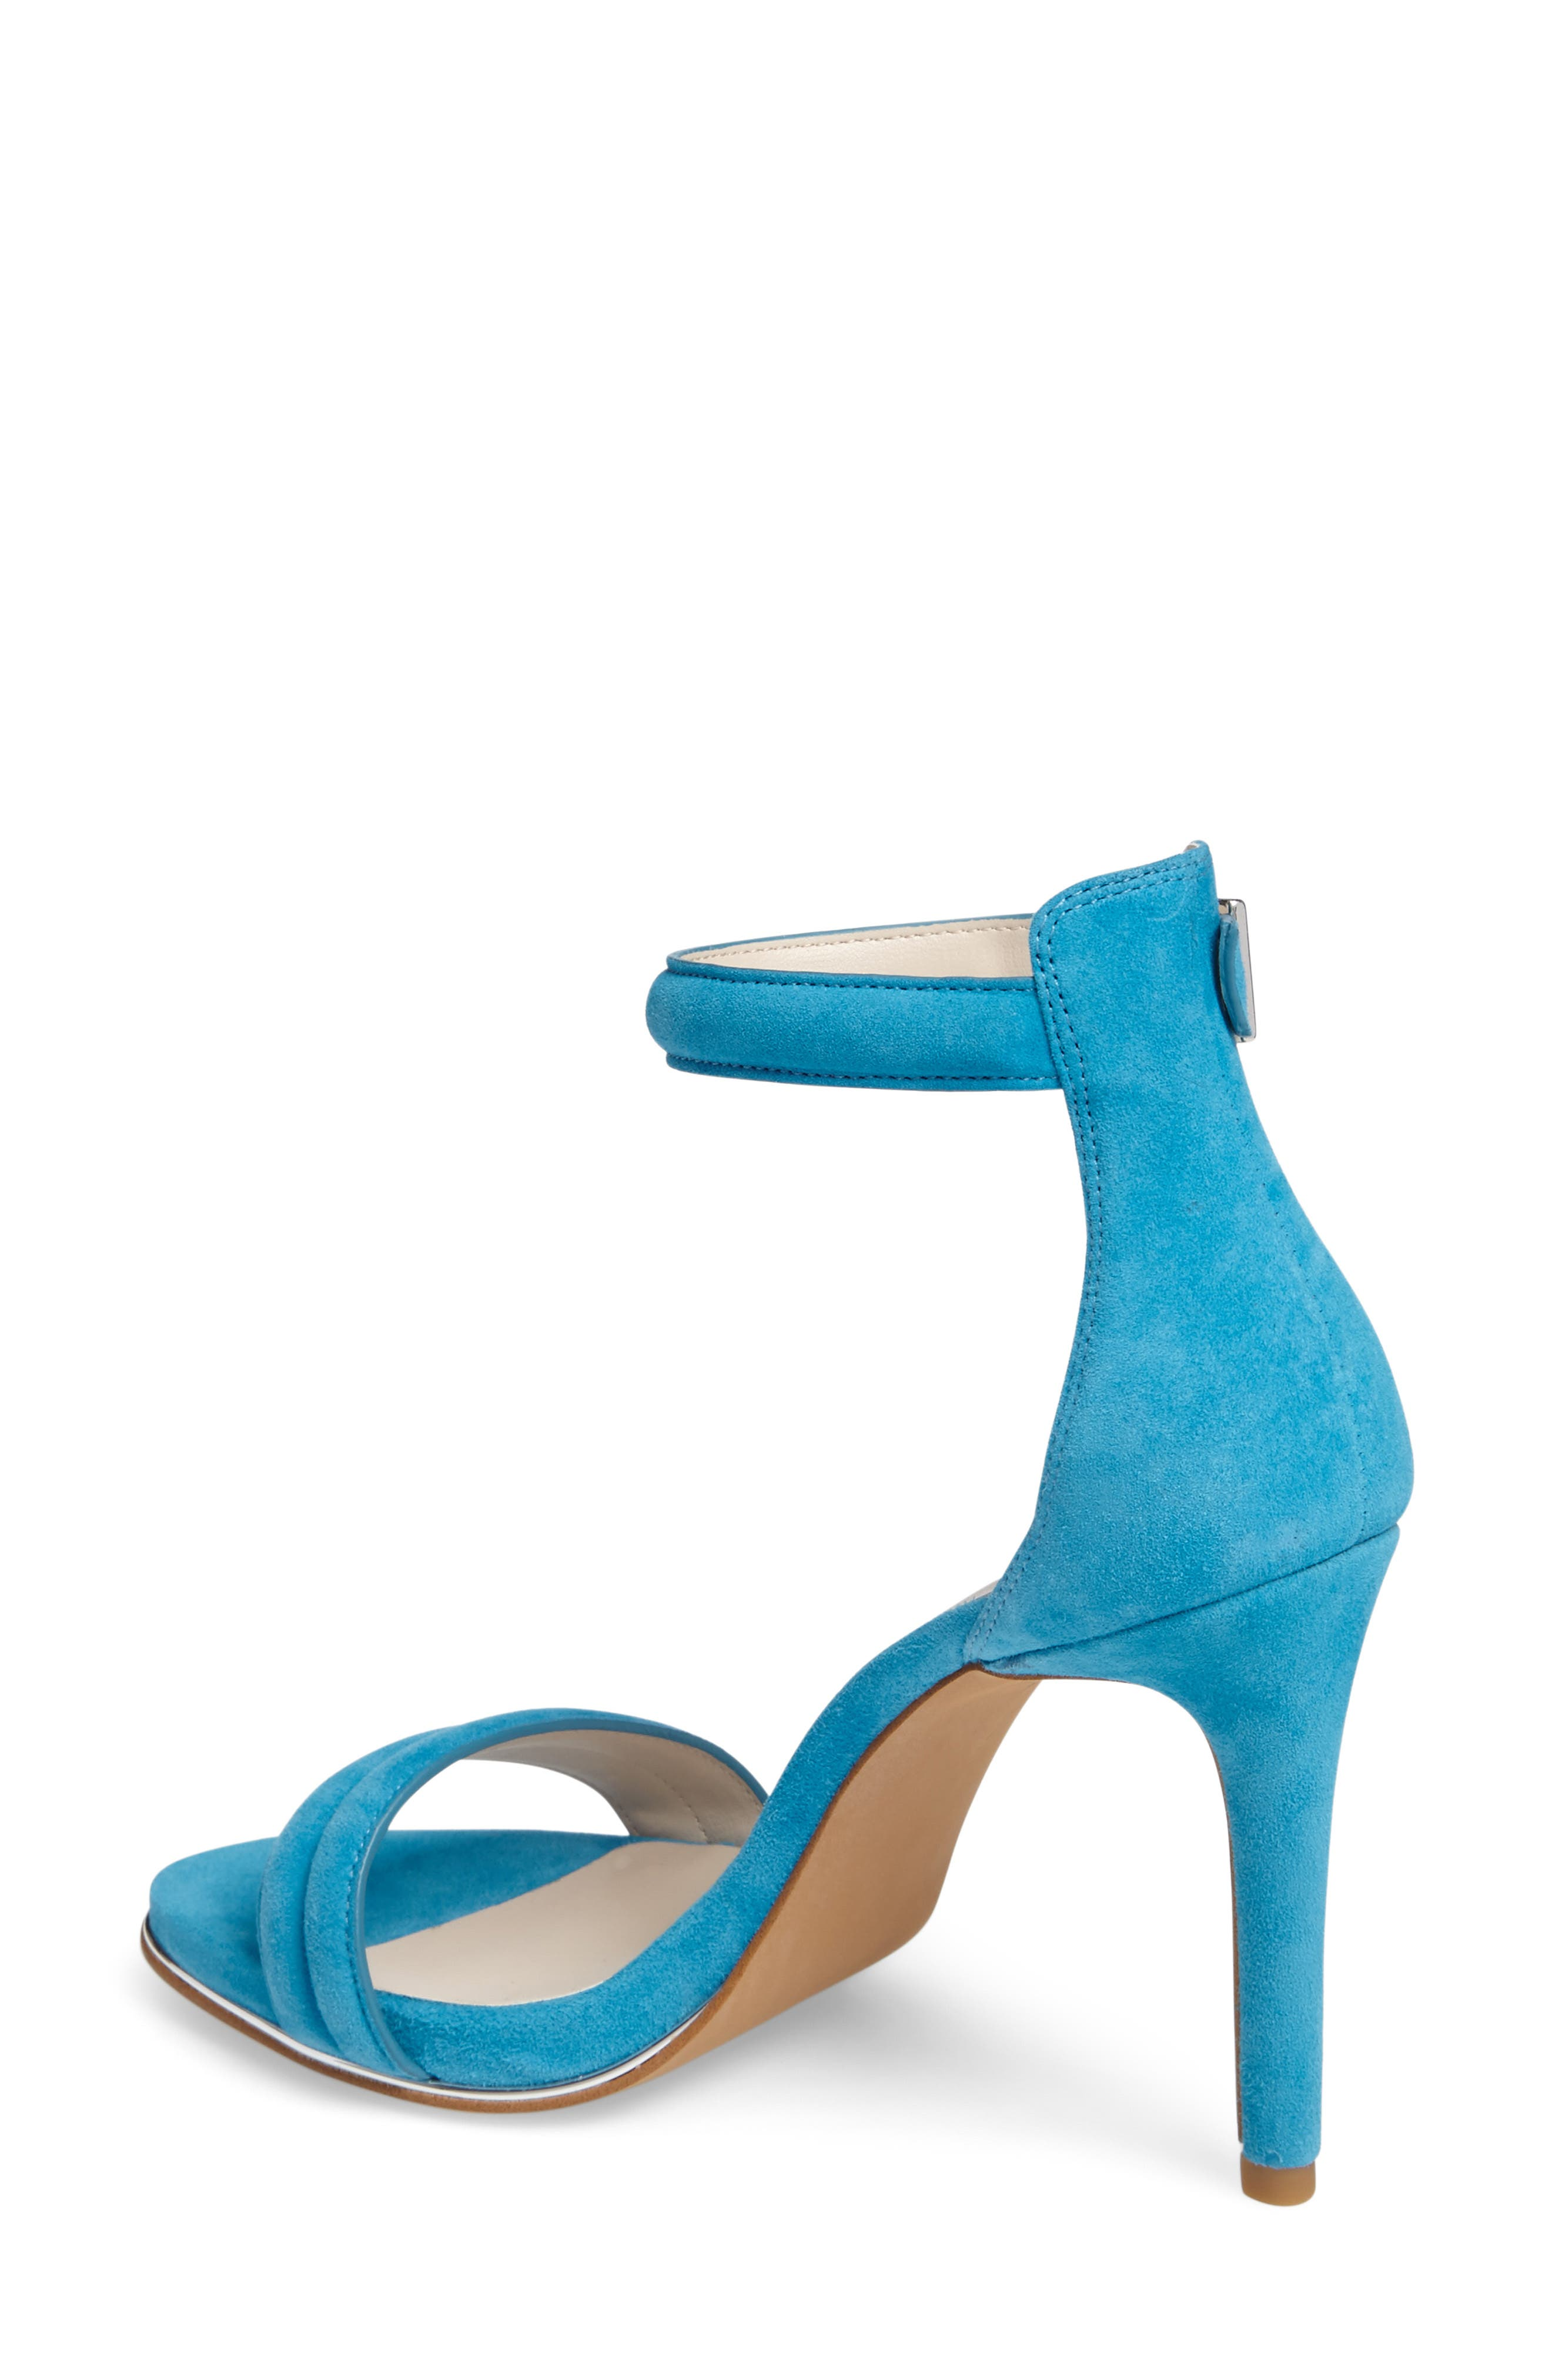 Alternate Image 2  - Kenneth Cole New York 'Brooke' Ankle Strap Sandal (Women)